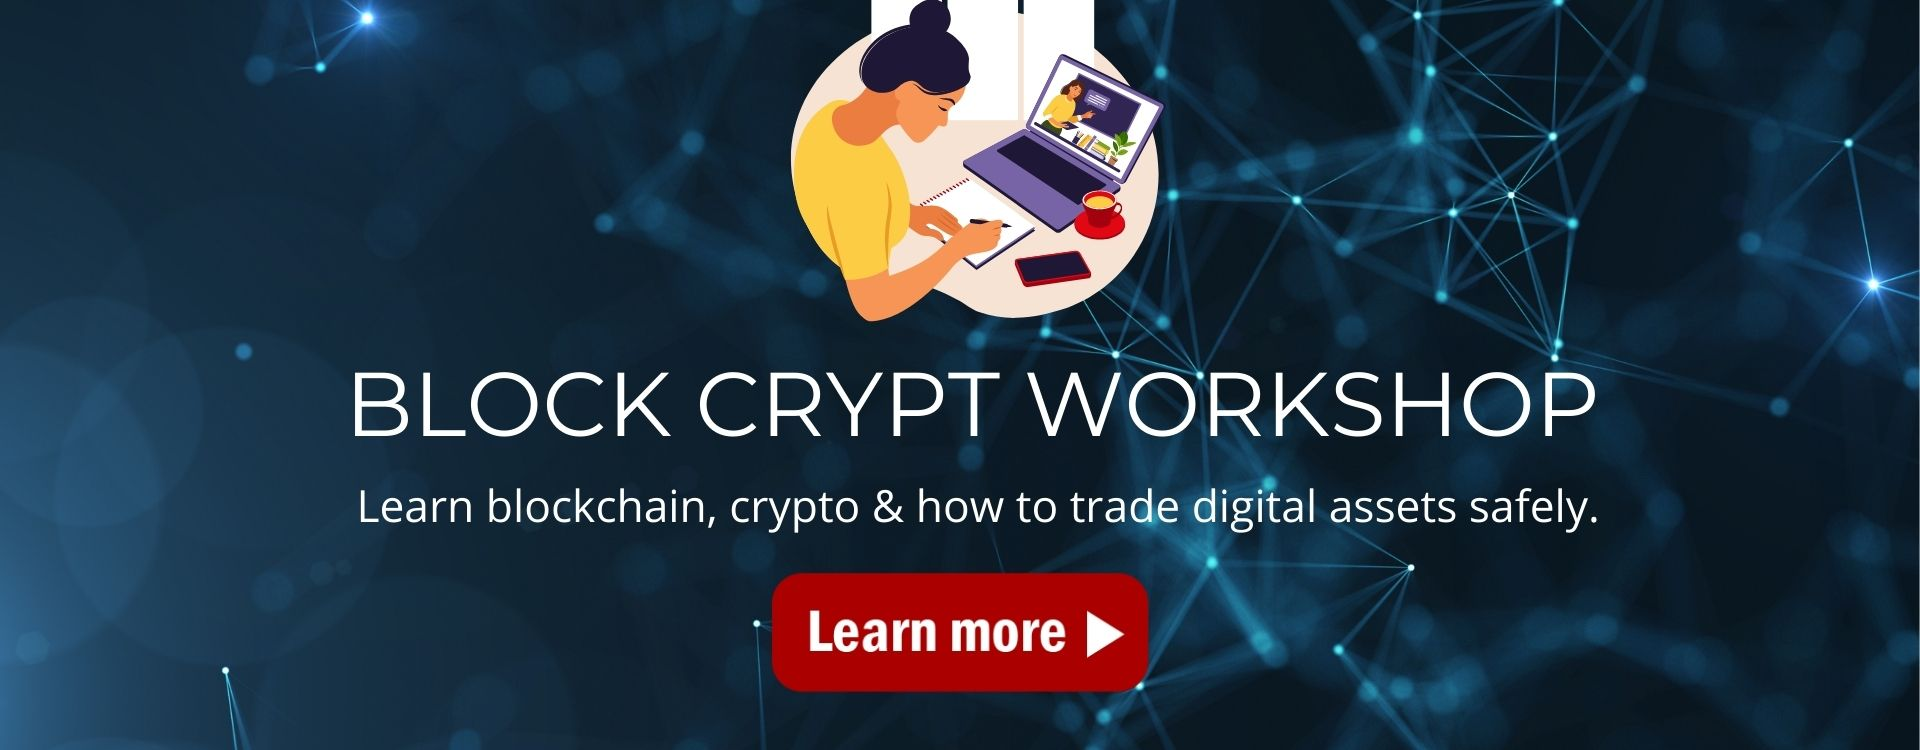 Block Crypt Workshop Home Page Header